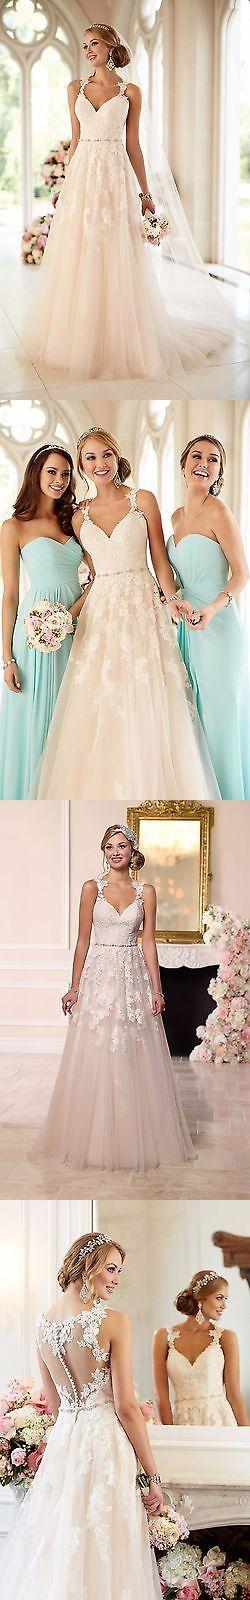 Wedding Dresses: 2016 White Ivory Tulle Bridal Gown Wedding Dress Custom Size 4-6-8-10-12-16-18+ -> BUY IT NOW ONLY: $110 on eBay!